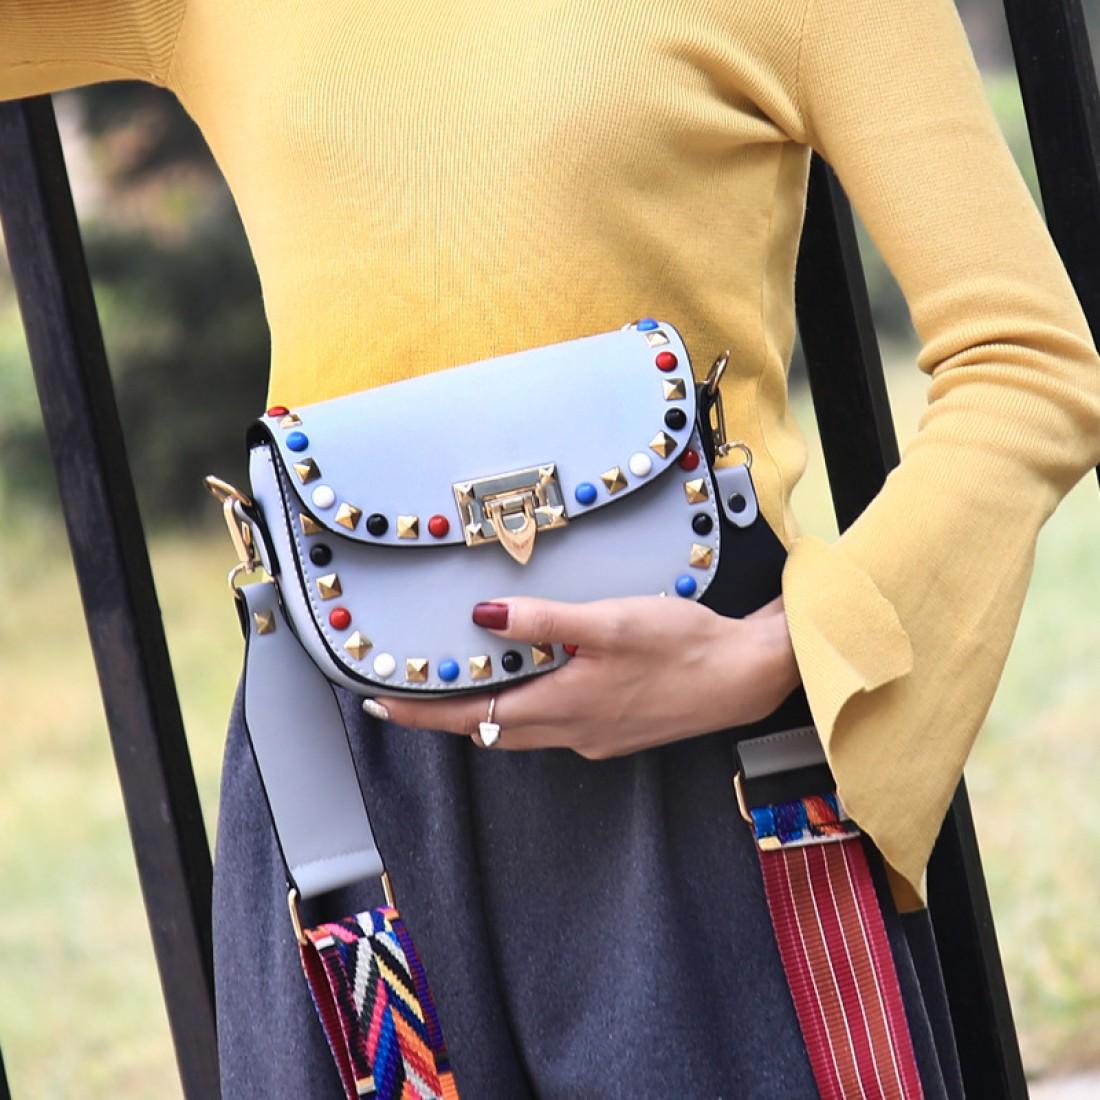 b7e3033b5284 Мини-сумочки: ТОП-3 стильных варианта - Тренды моды, мода 2017 ...